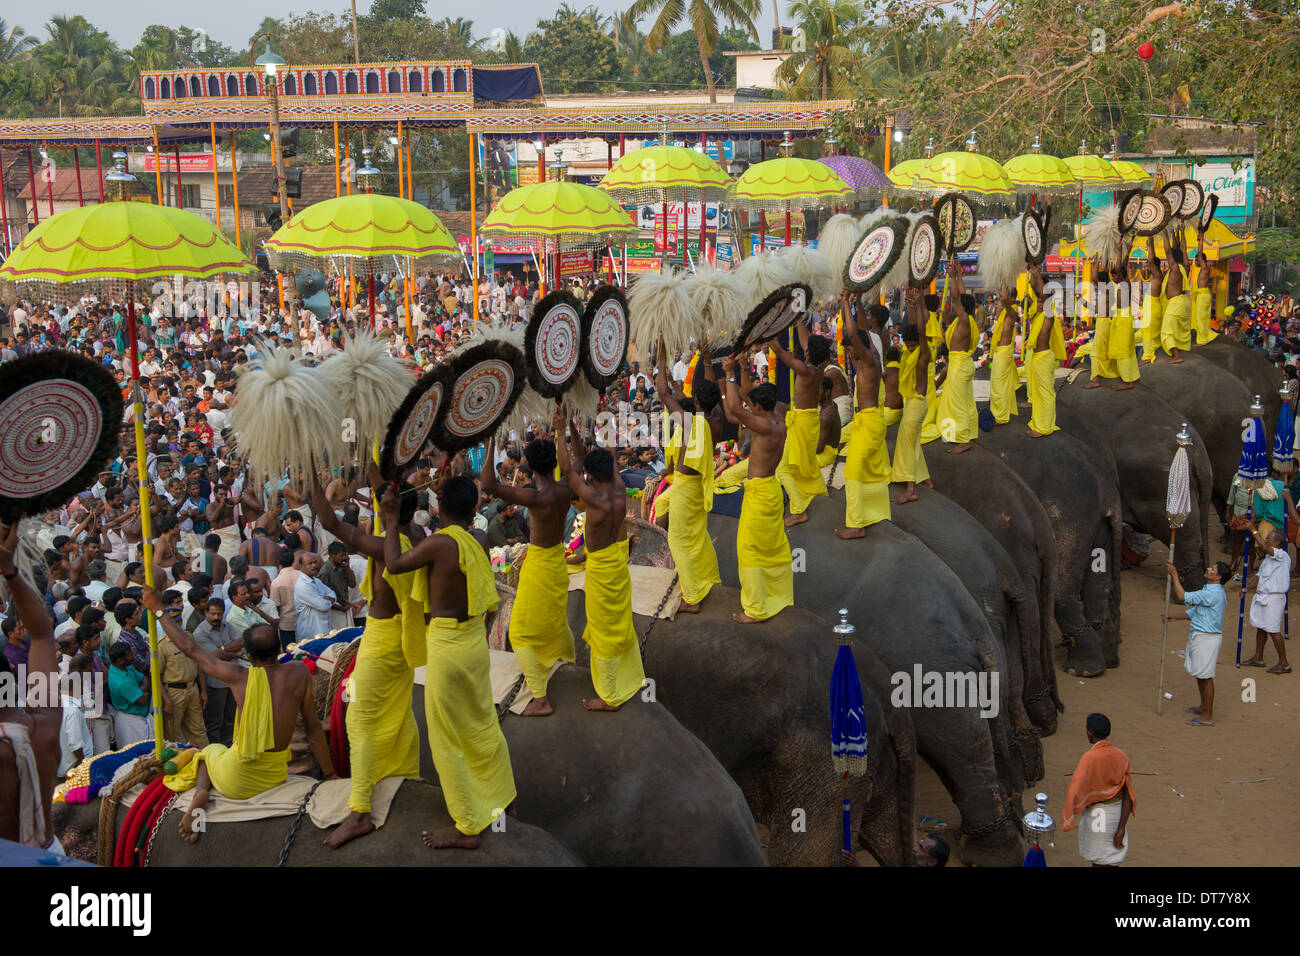 Line of elephants being ridden by priests holding Muthukuda parasols and Venchamaram whisks at the  Goureeswara Temple Festival, Cherai, near Kochi (Cochin), Kerala, India - Stock Image